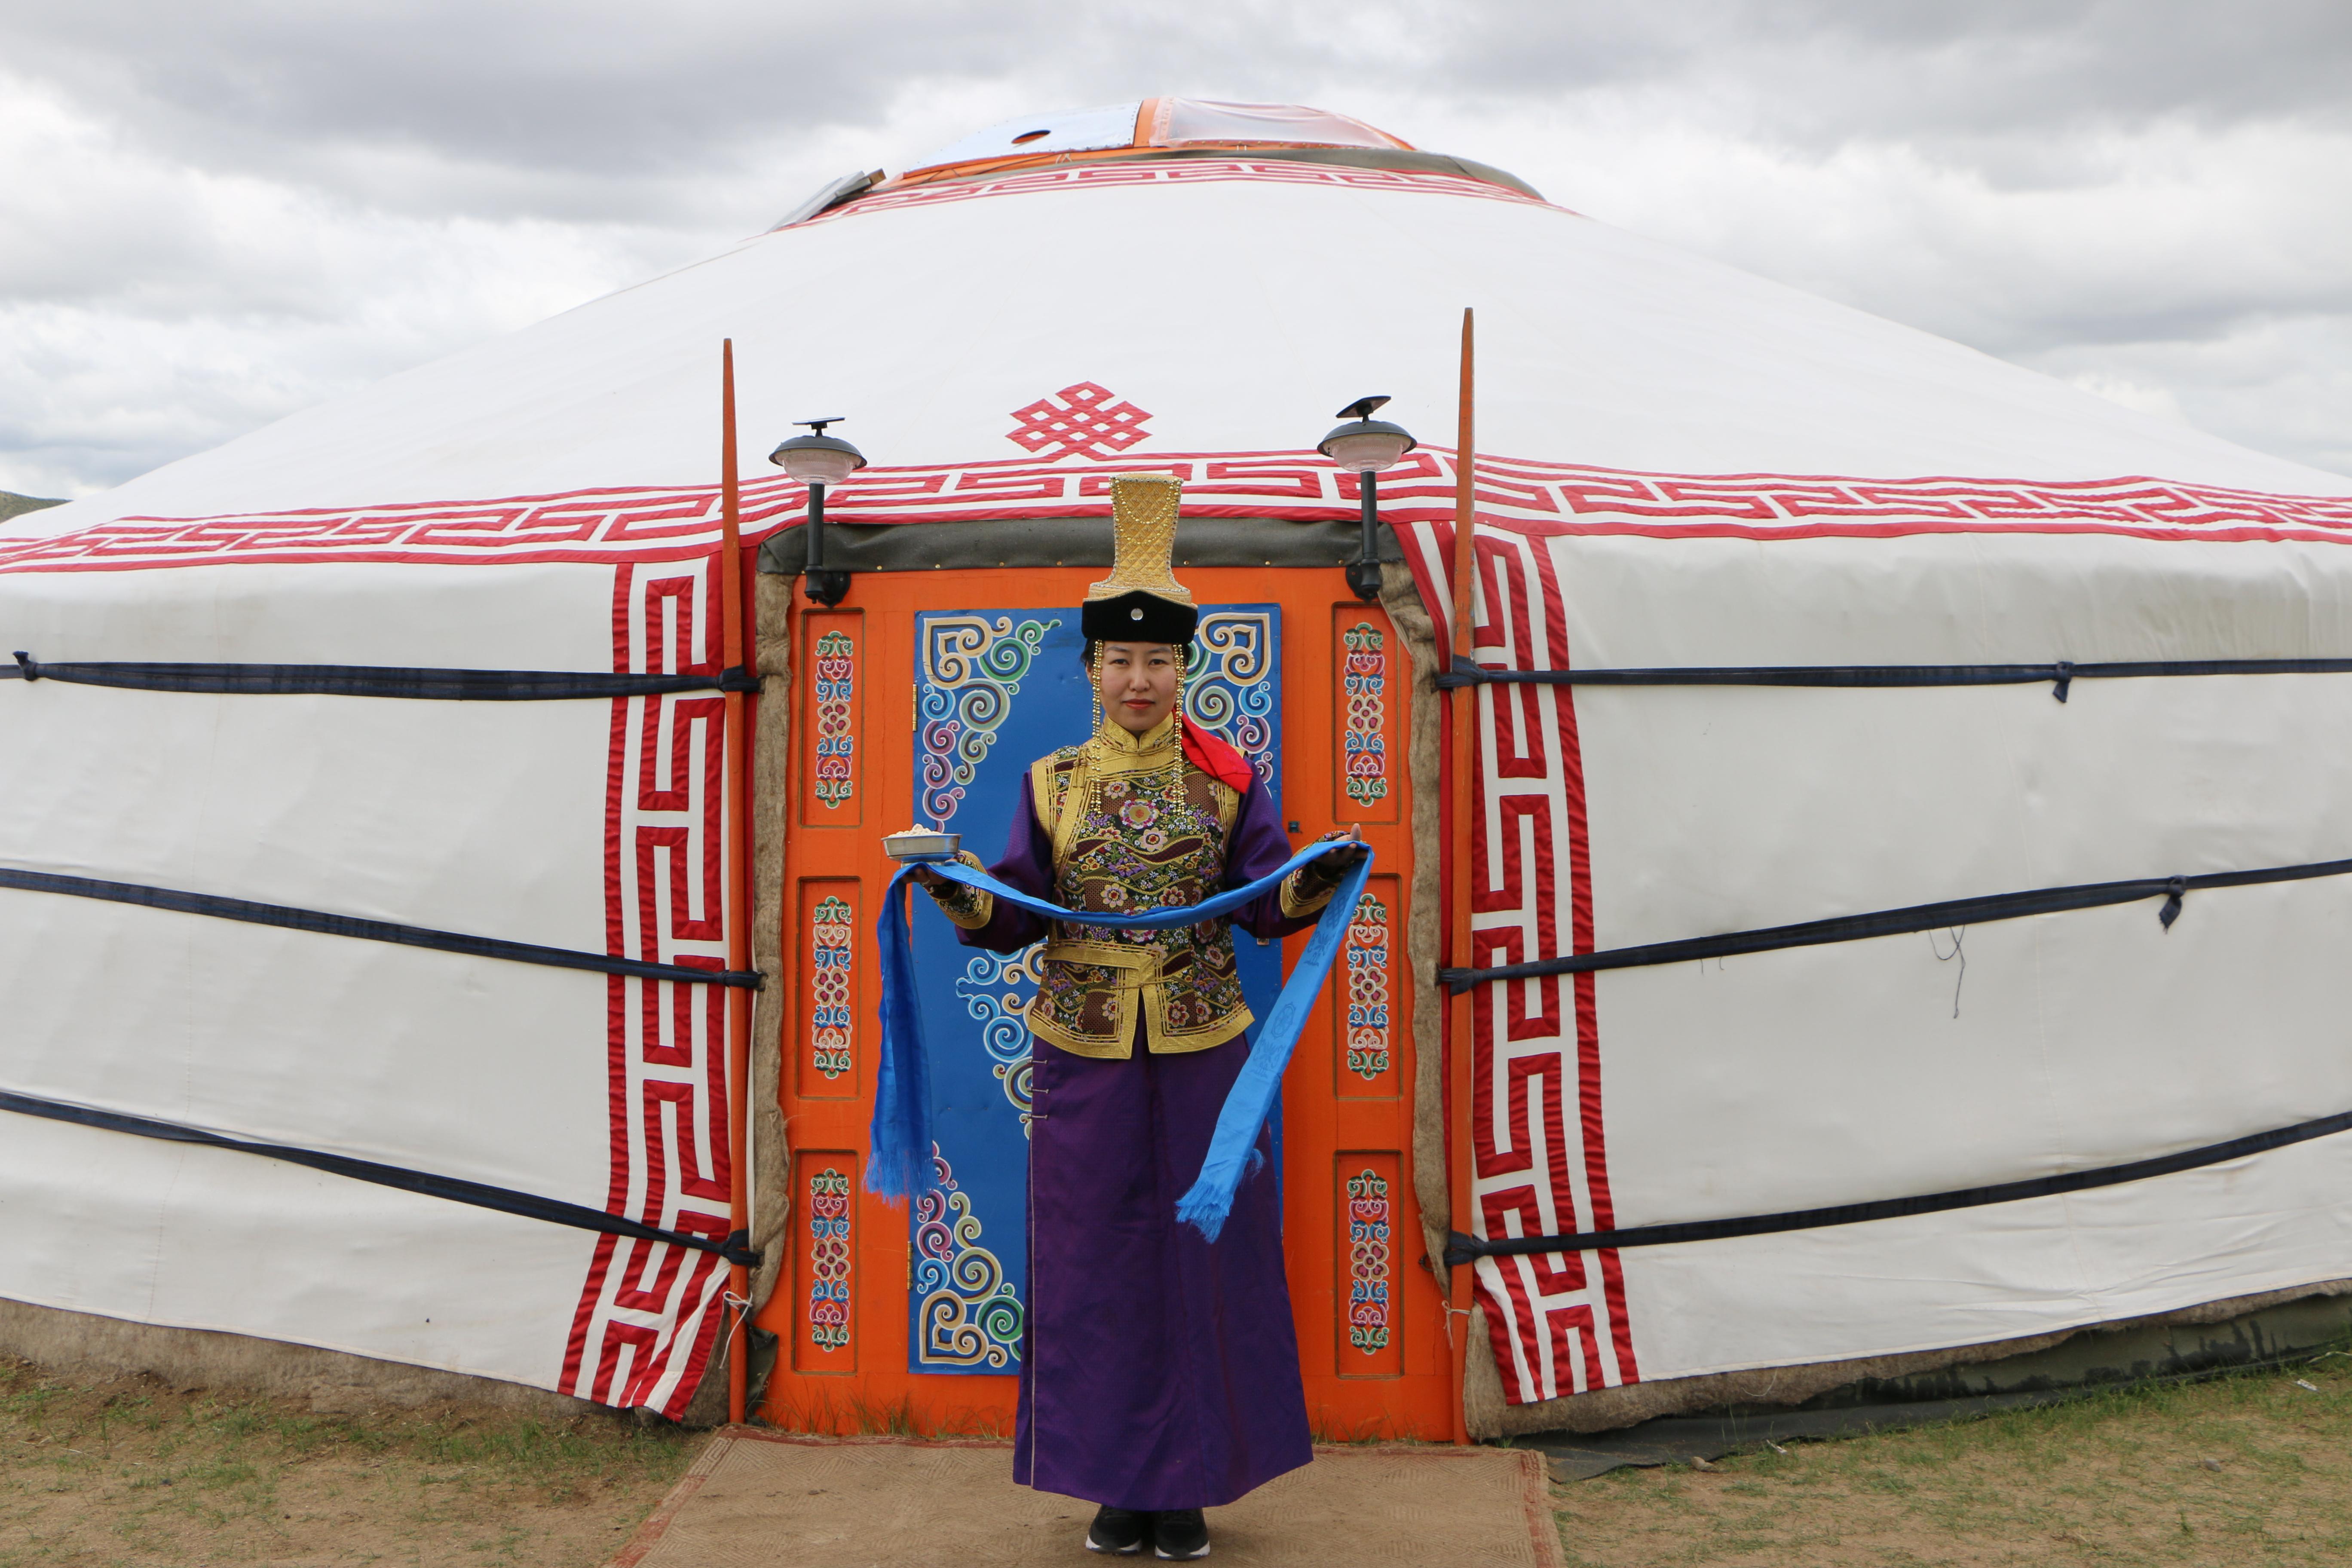 Nomadic Impressions - Mongolia, Ger Camp